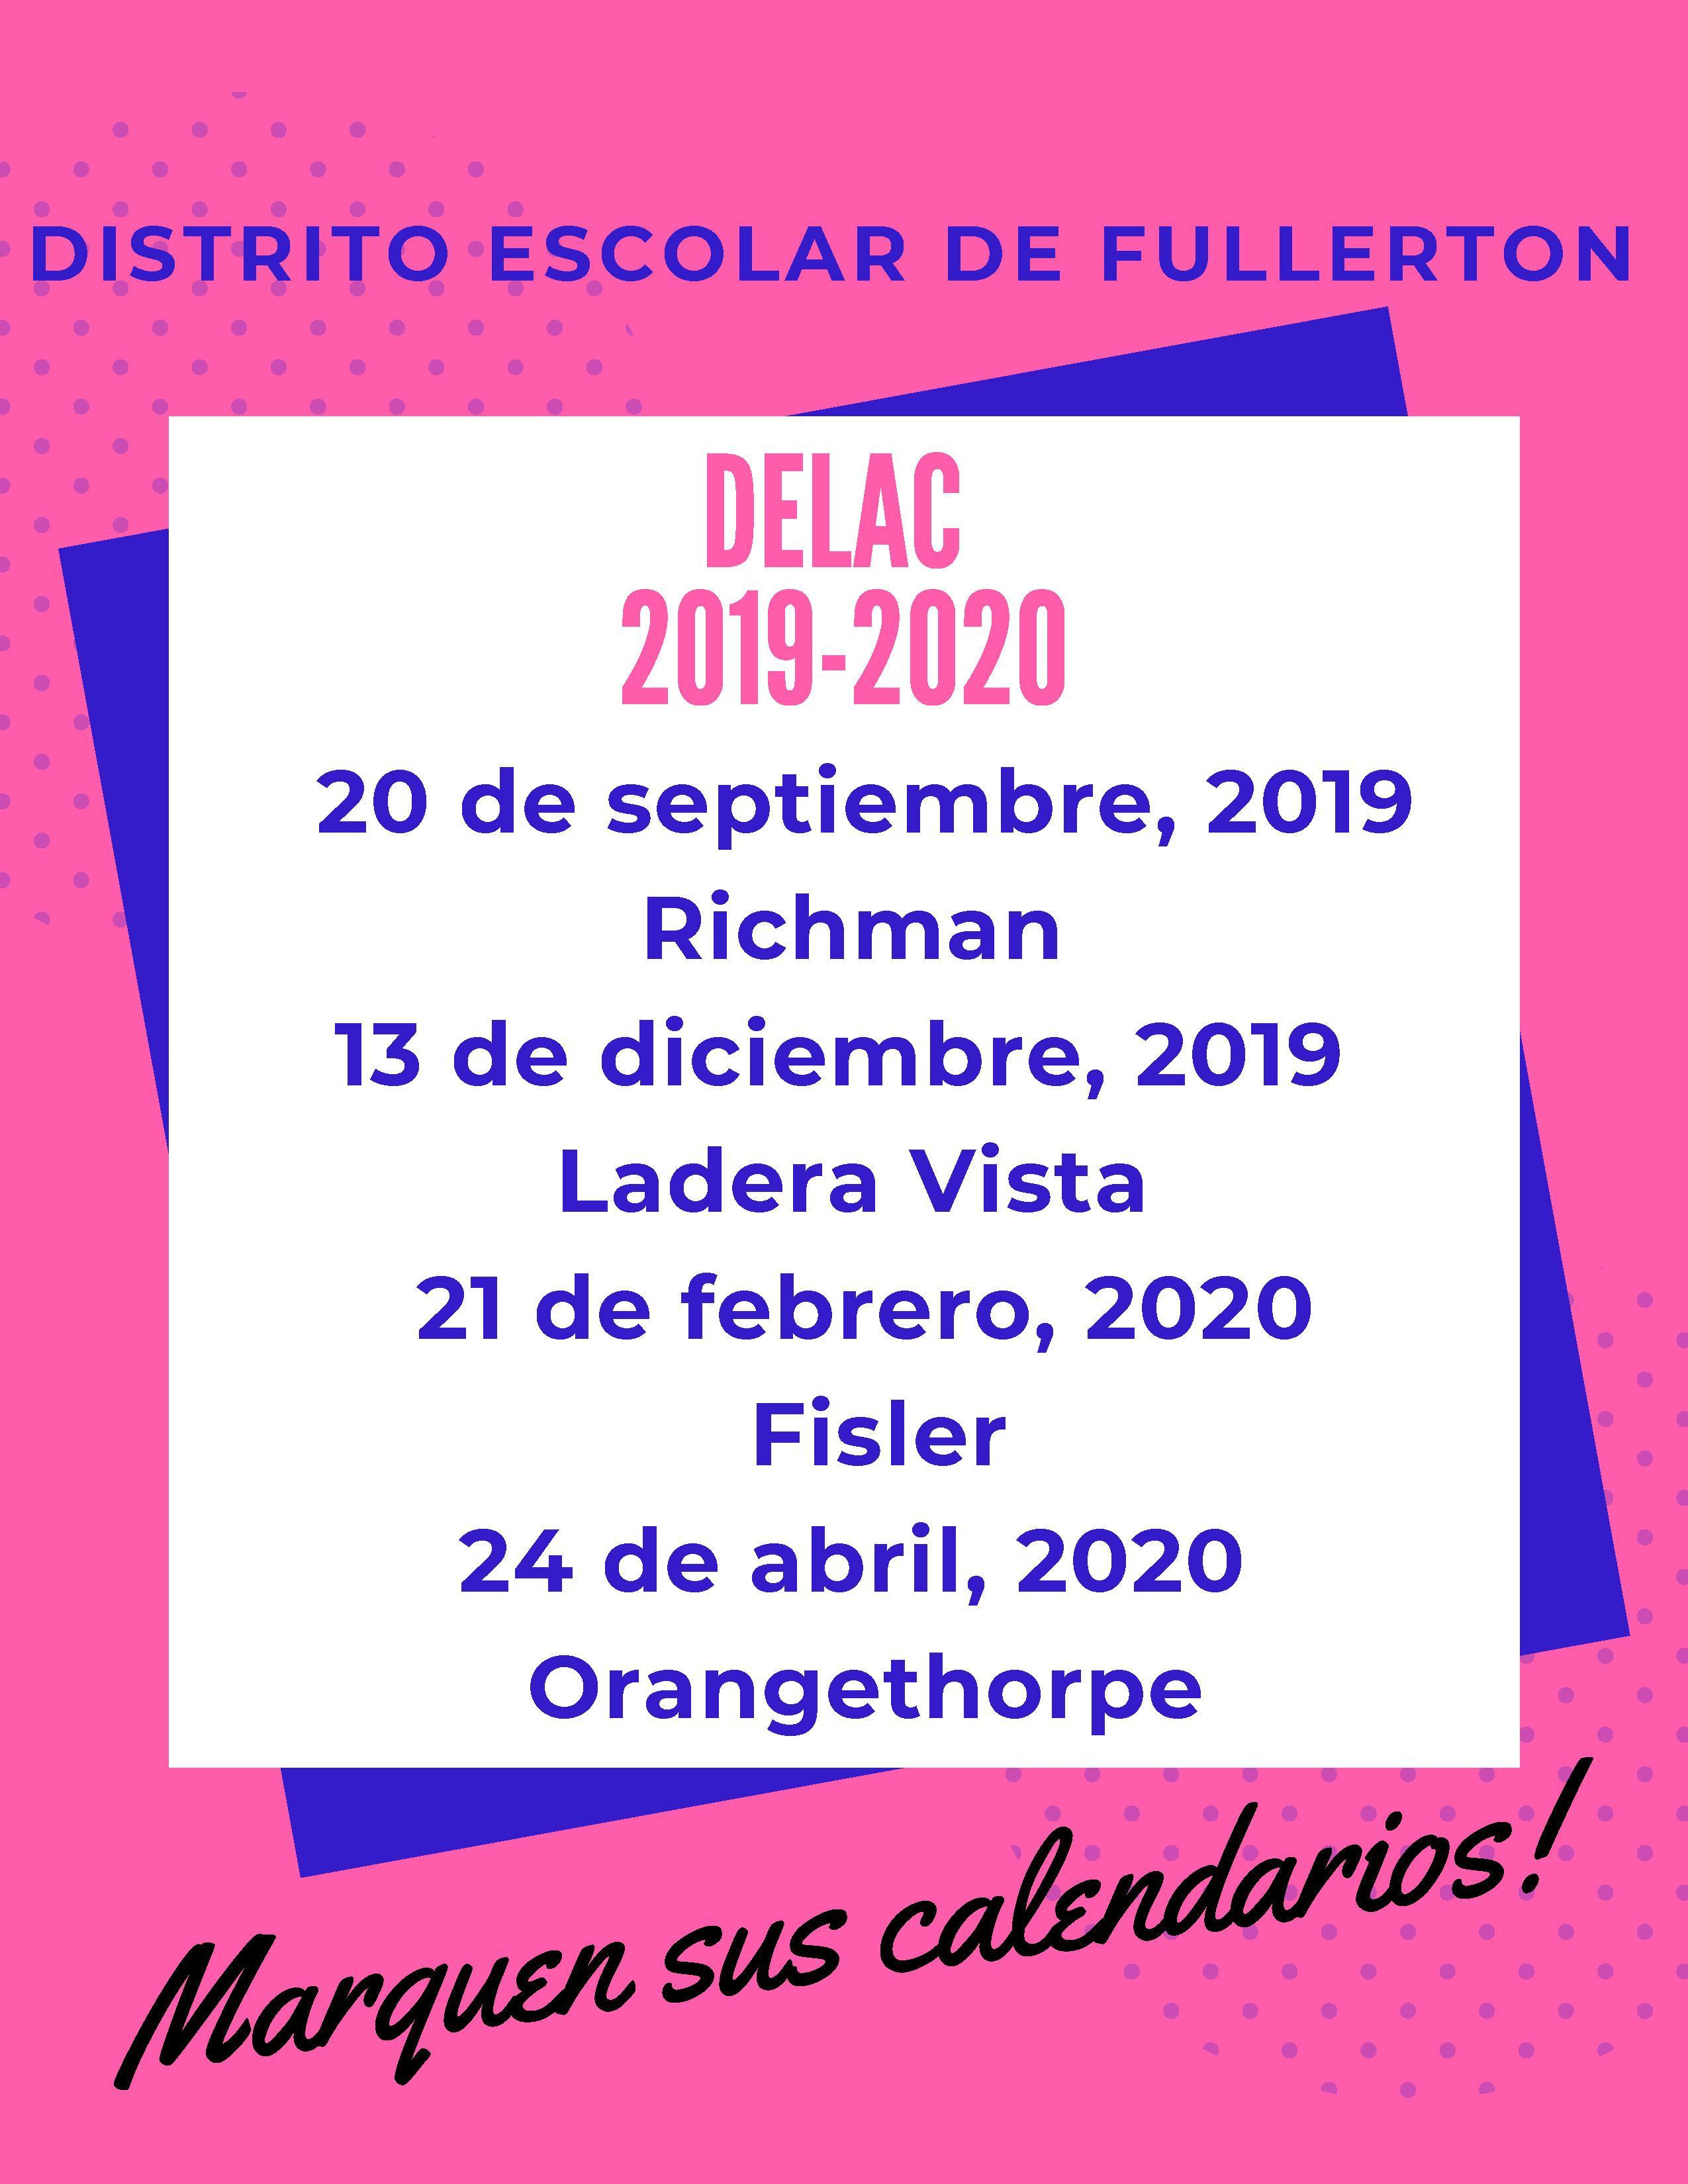 DELAC Dates 19-20 Spanish Flyer